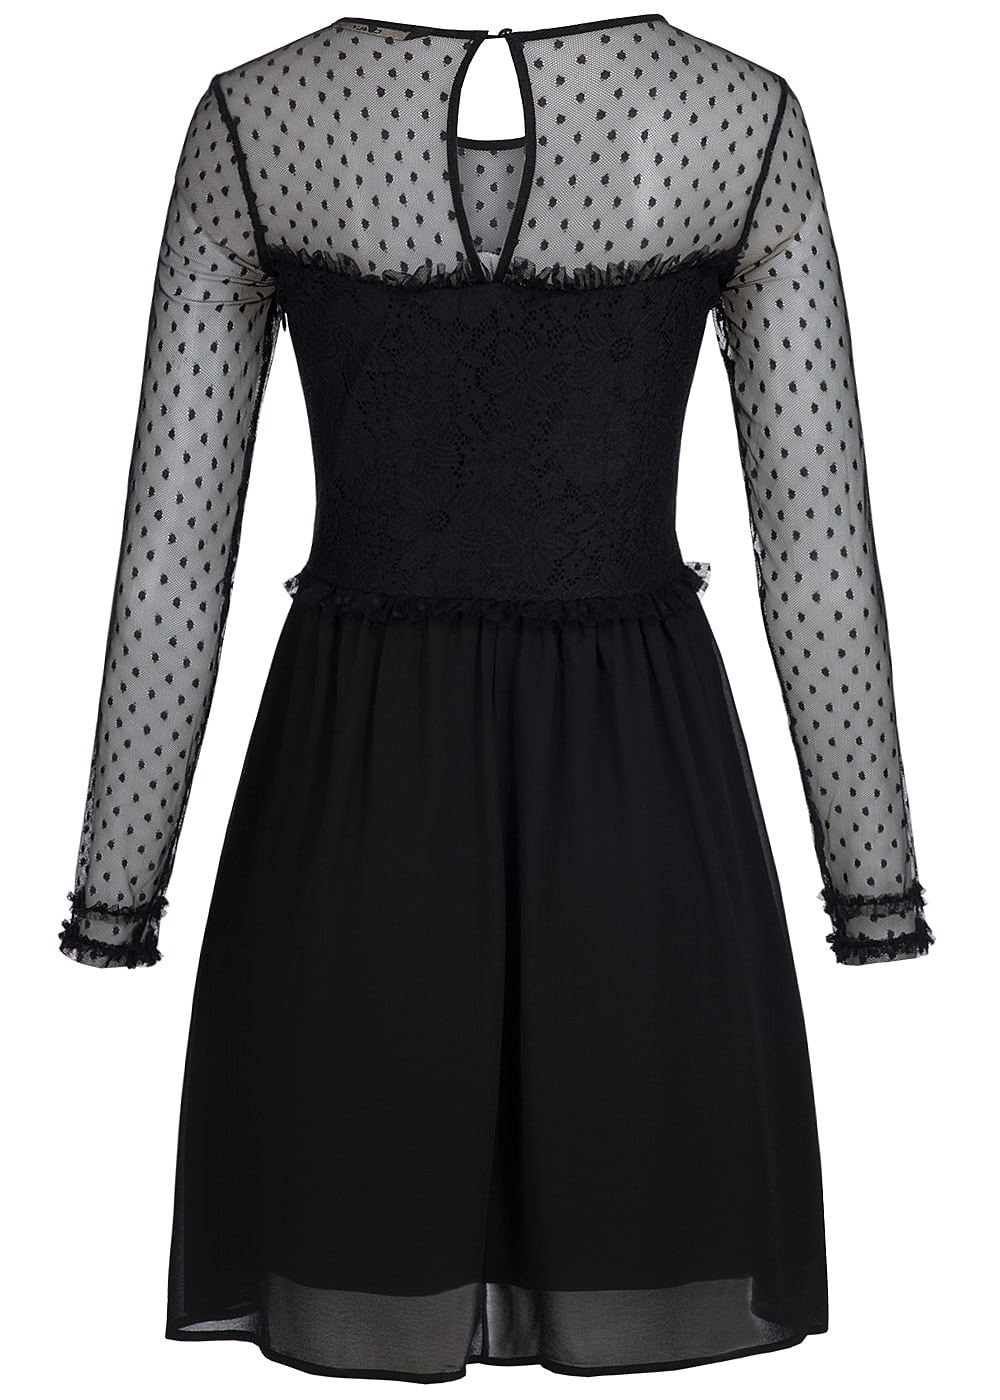 ONLY Damen Kleid Mini Mesh Spitze Blumen Muster schwarz ...